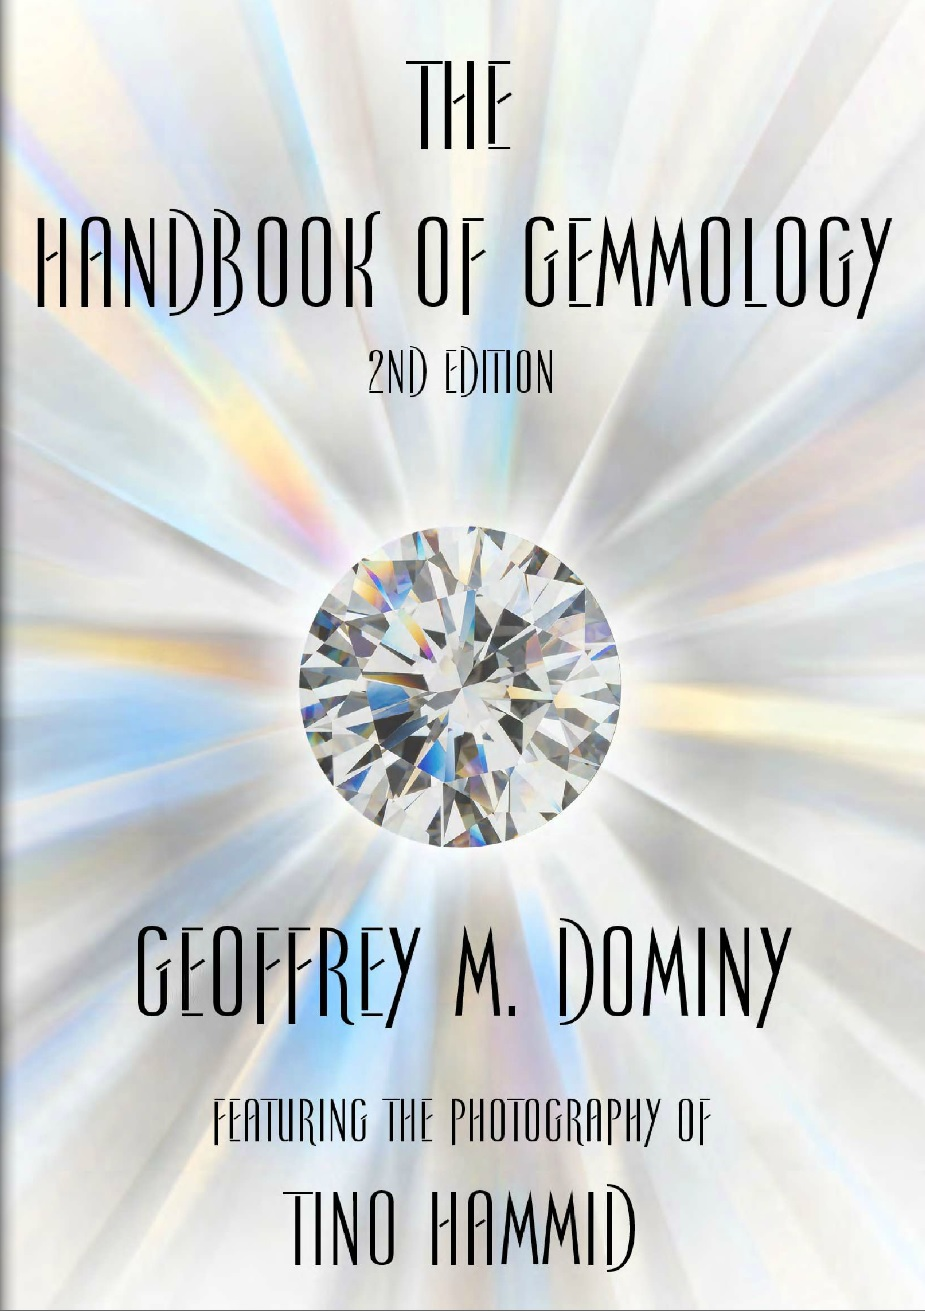 The Handbook of Gemmology